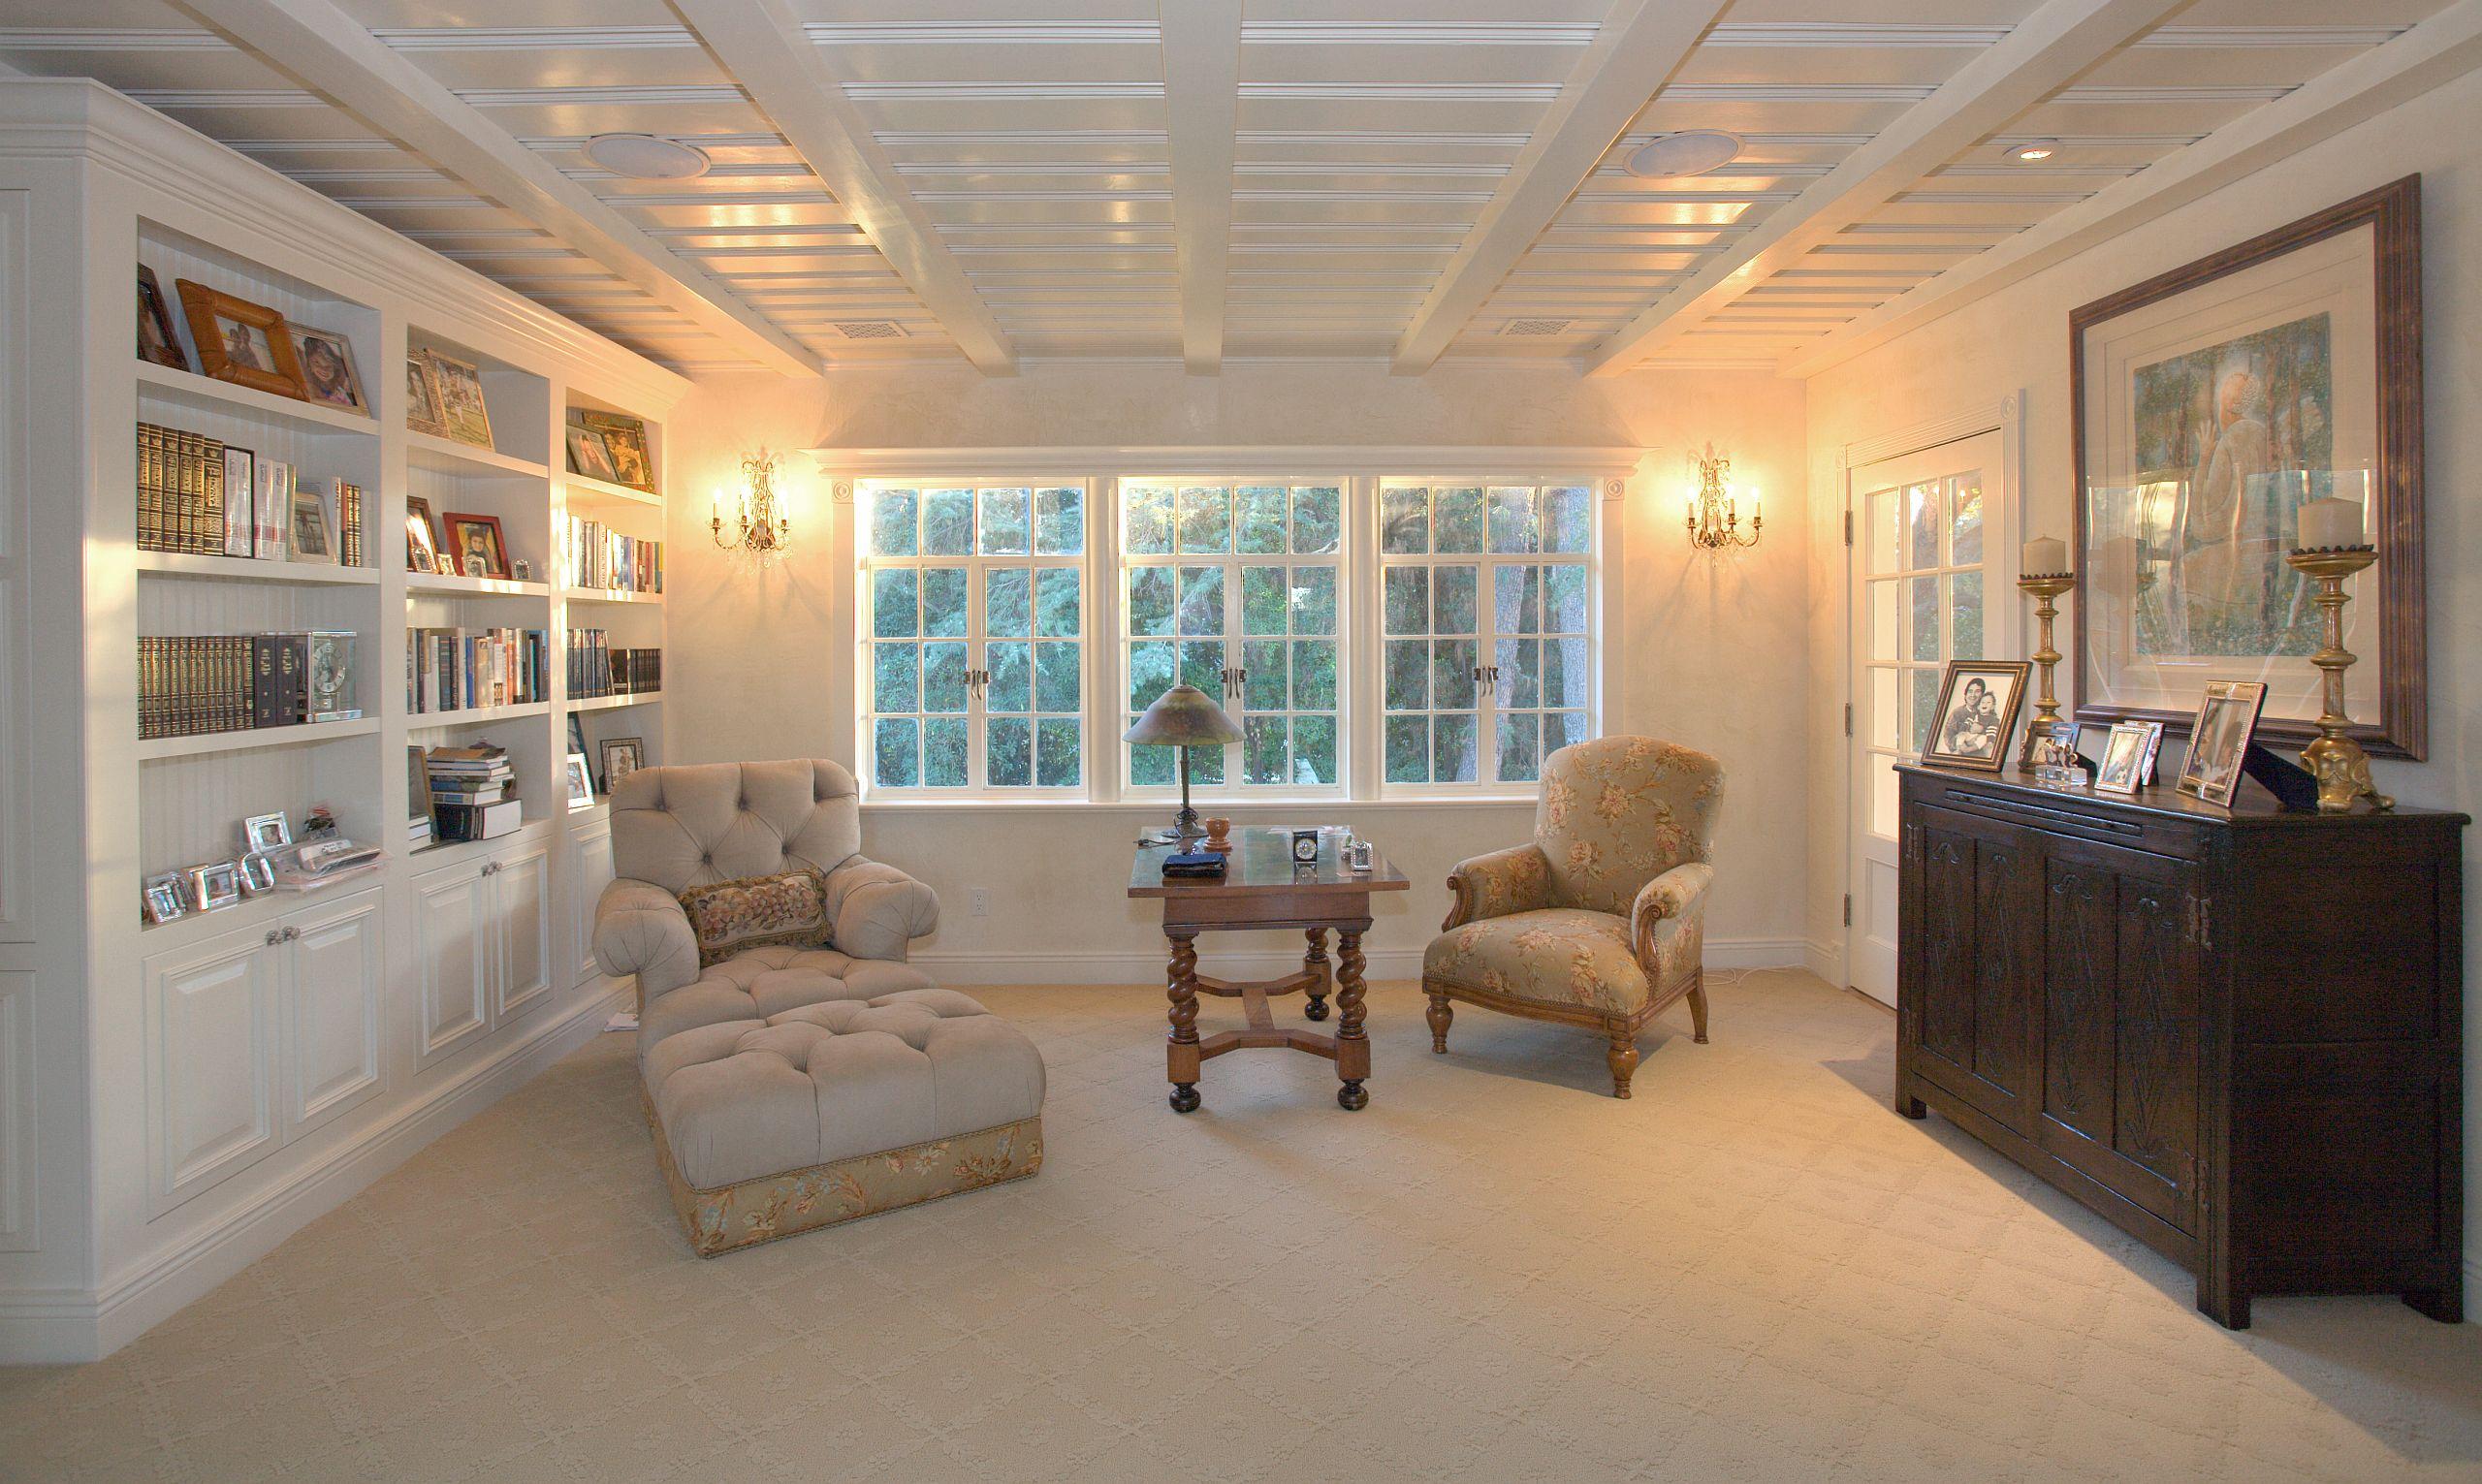 Inhabit Space Inc Renovates Historic Al Jolson Estate In